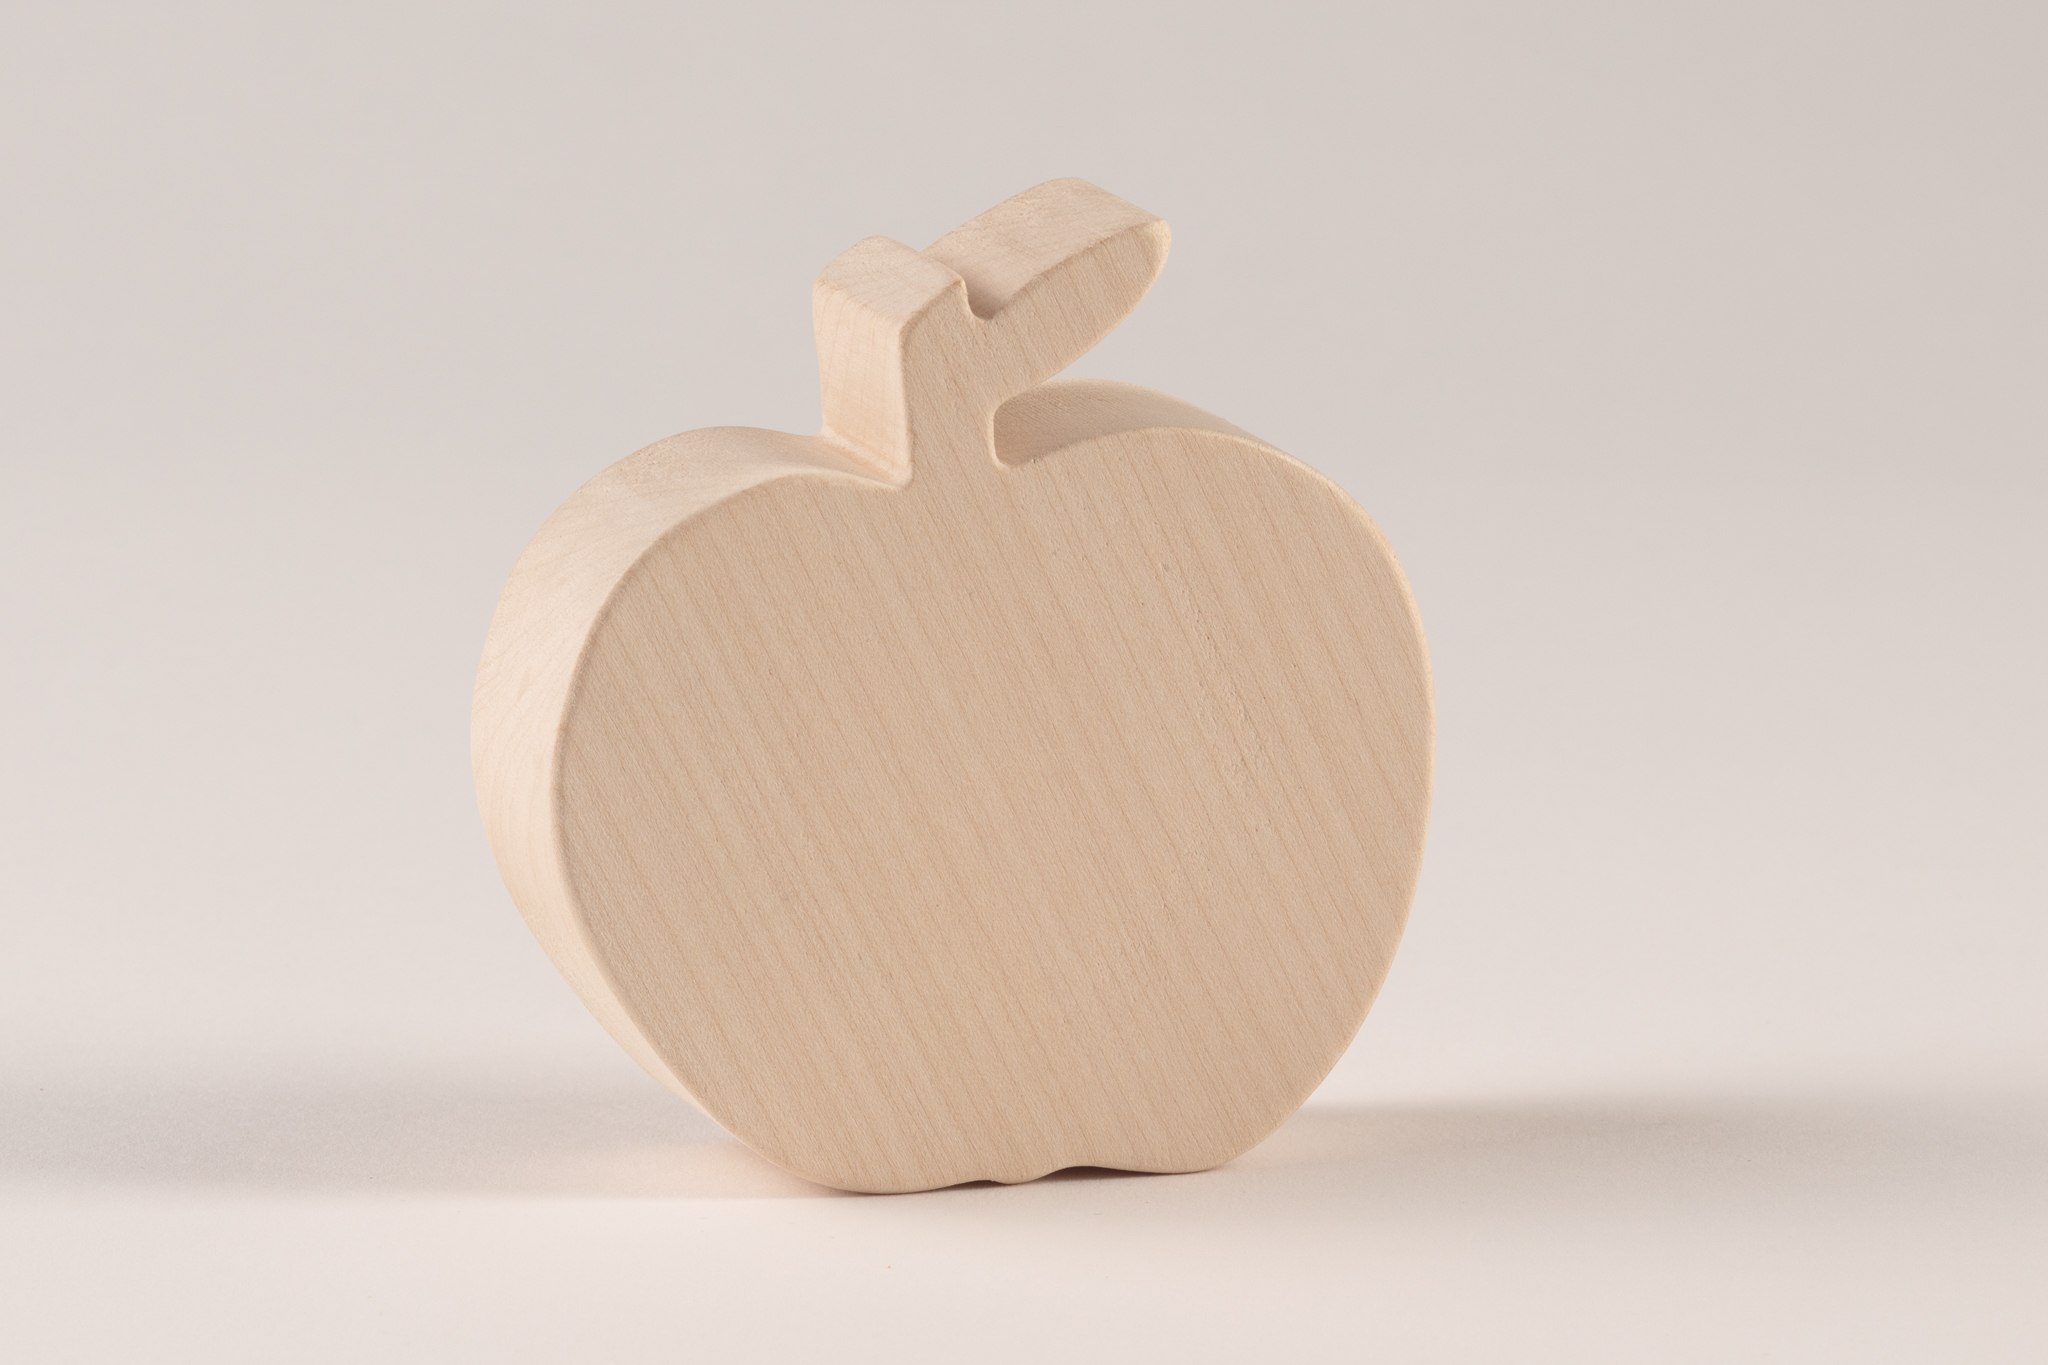 Holzspielzeug 14